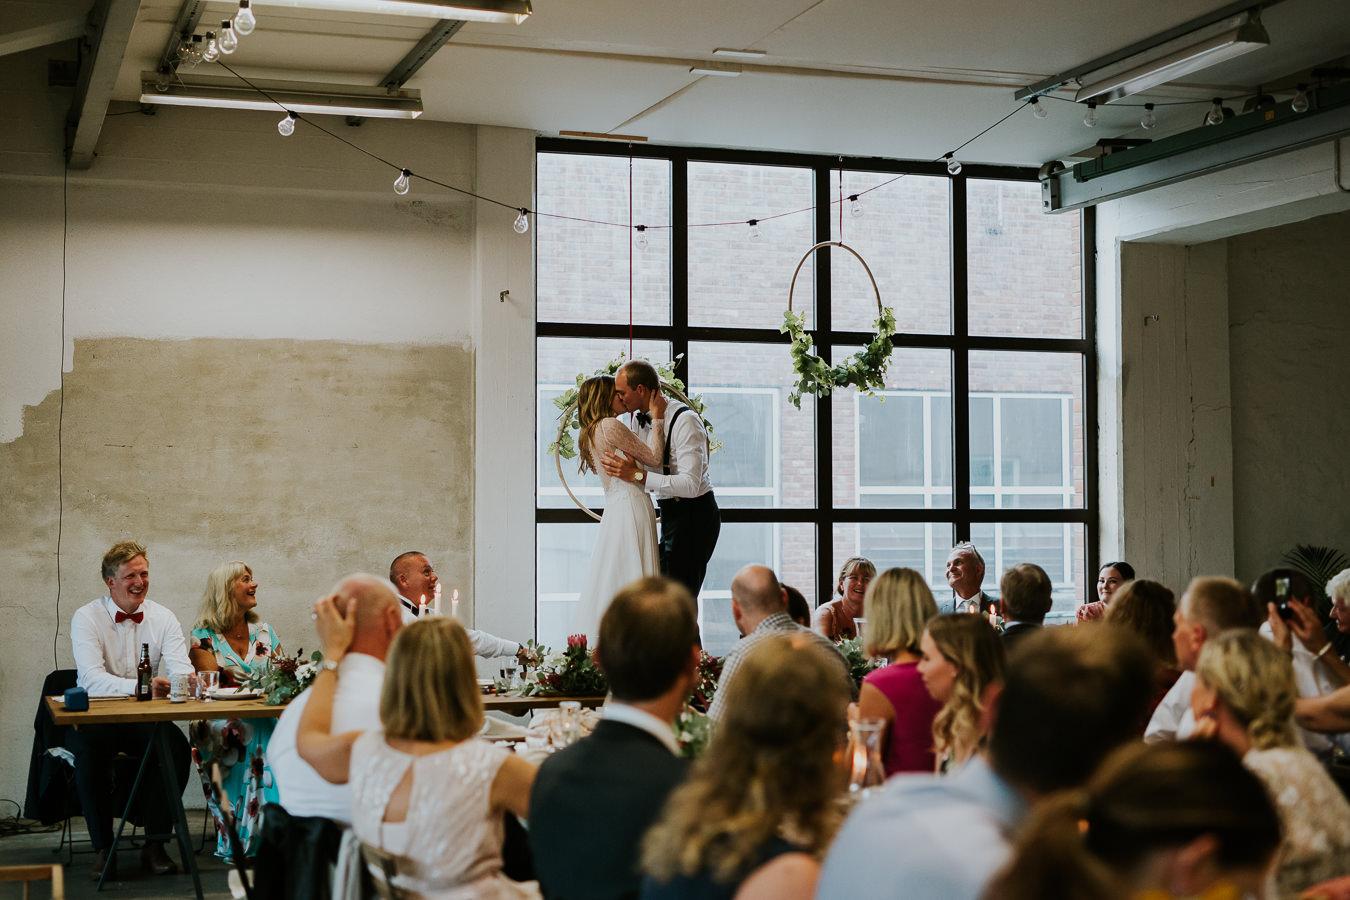 Bryllup-Lageret-Tofte-bryllupsfotograf-178.jpg